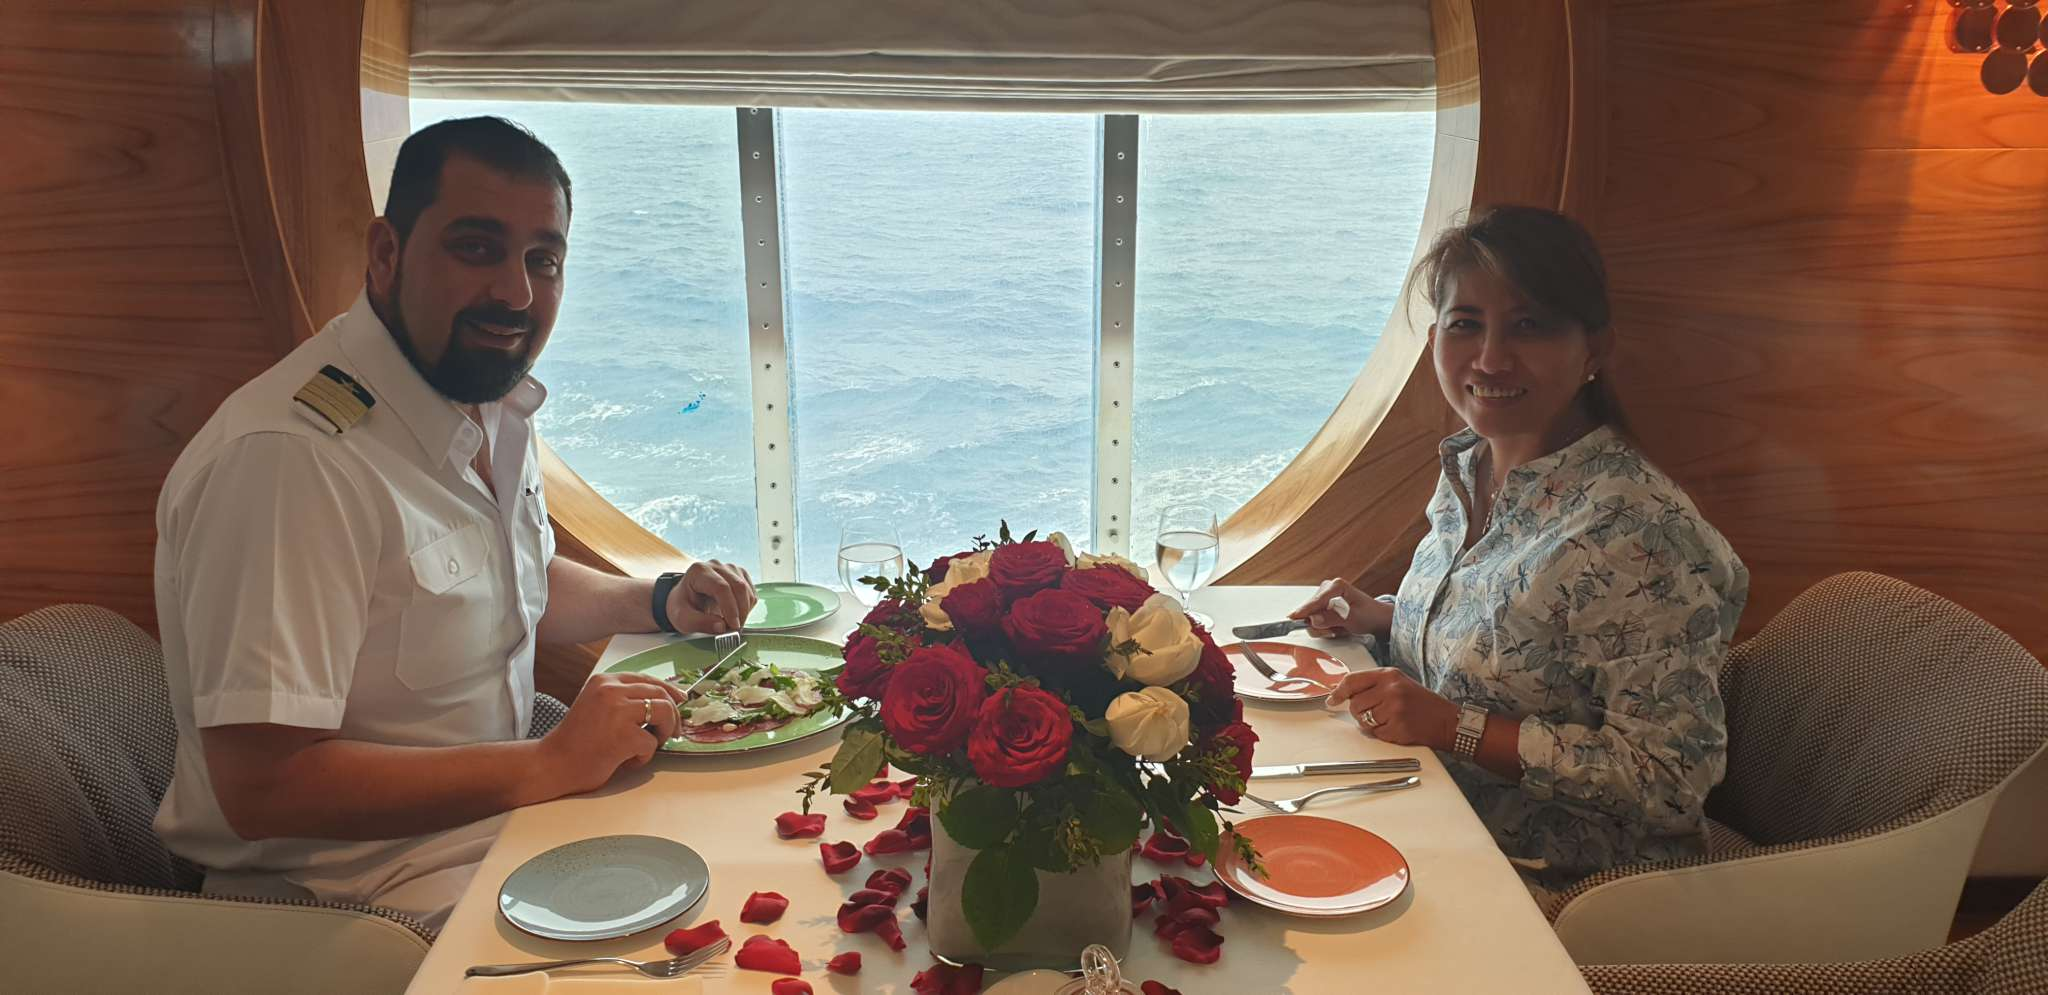 Mein Schiff Kapitän Panagiotis Varotsos und seine Frau im Restaurant La Spezia